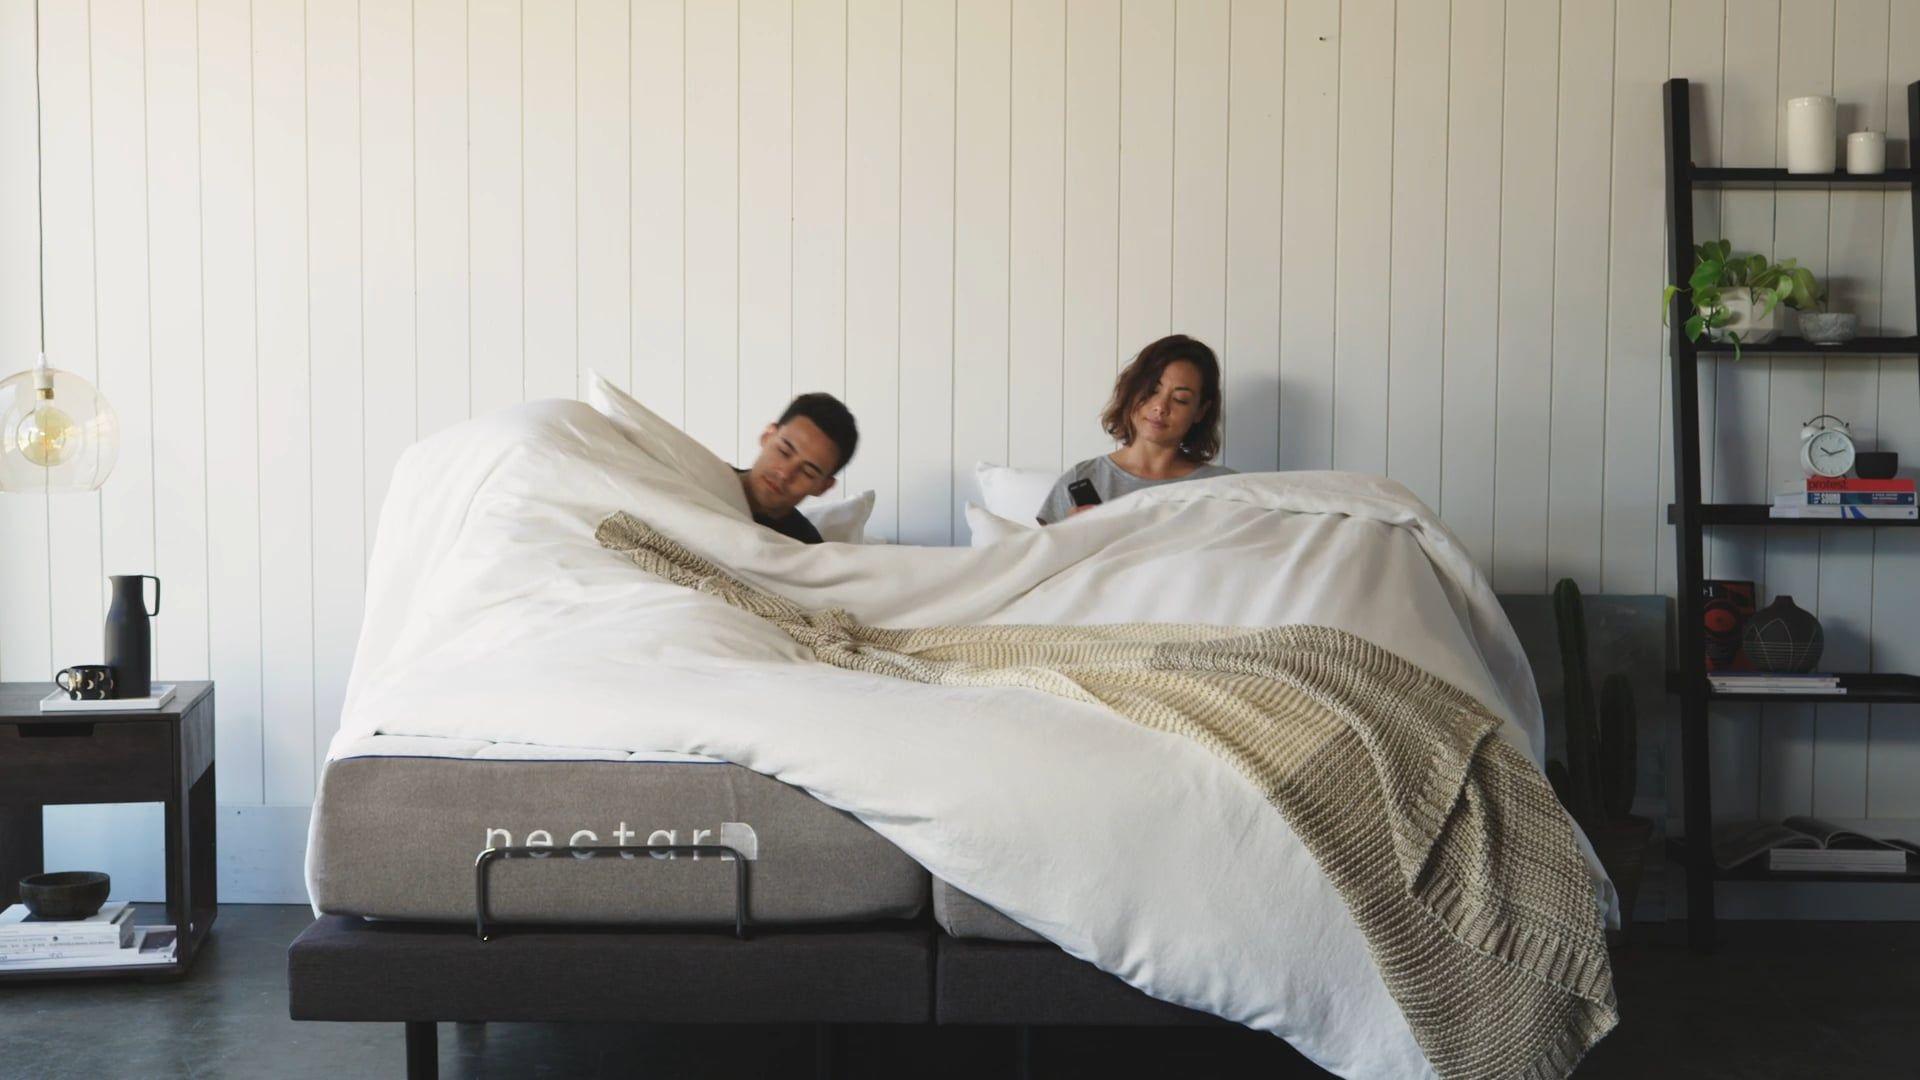 Nectar Adjustable Hero Video 30 Sec Adjustable Beds